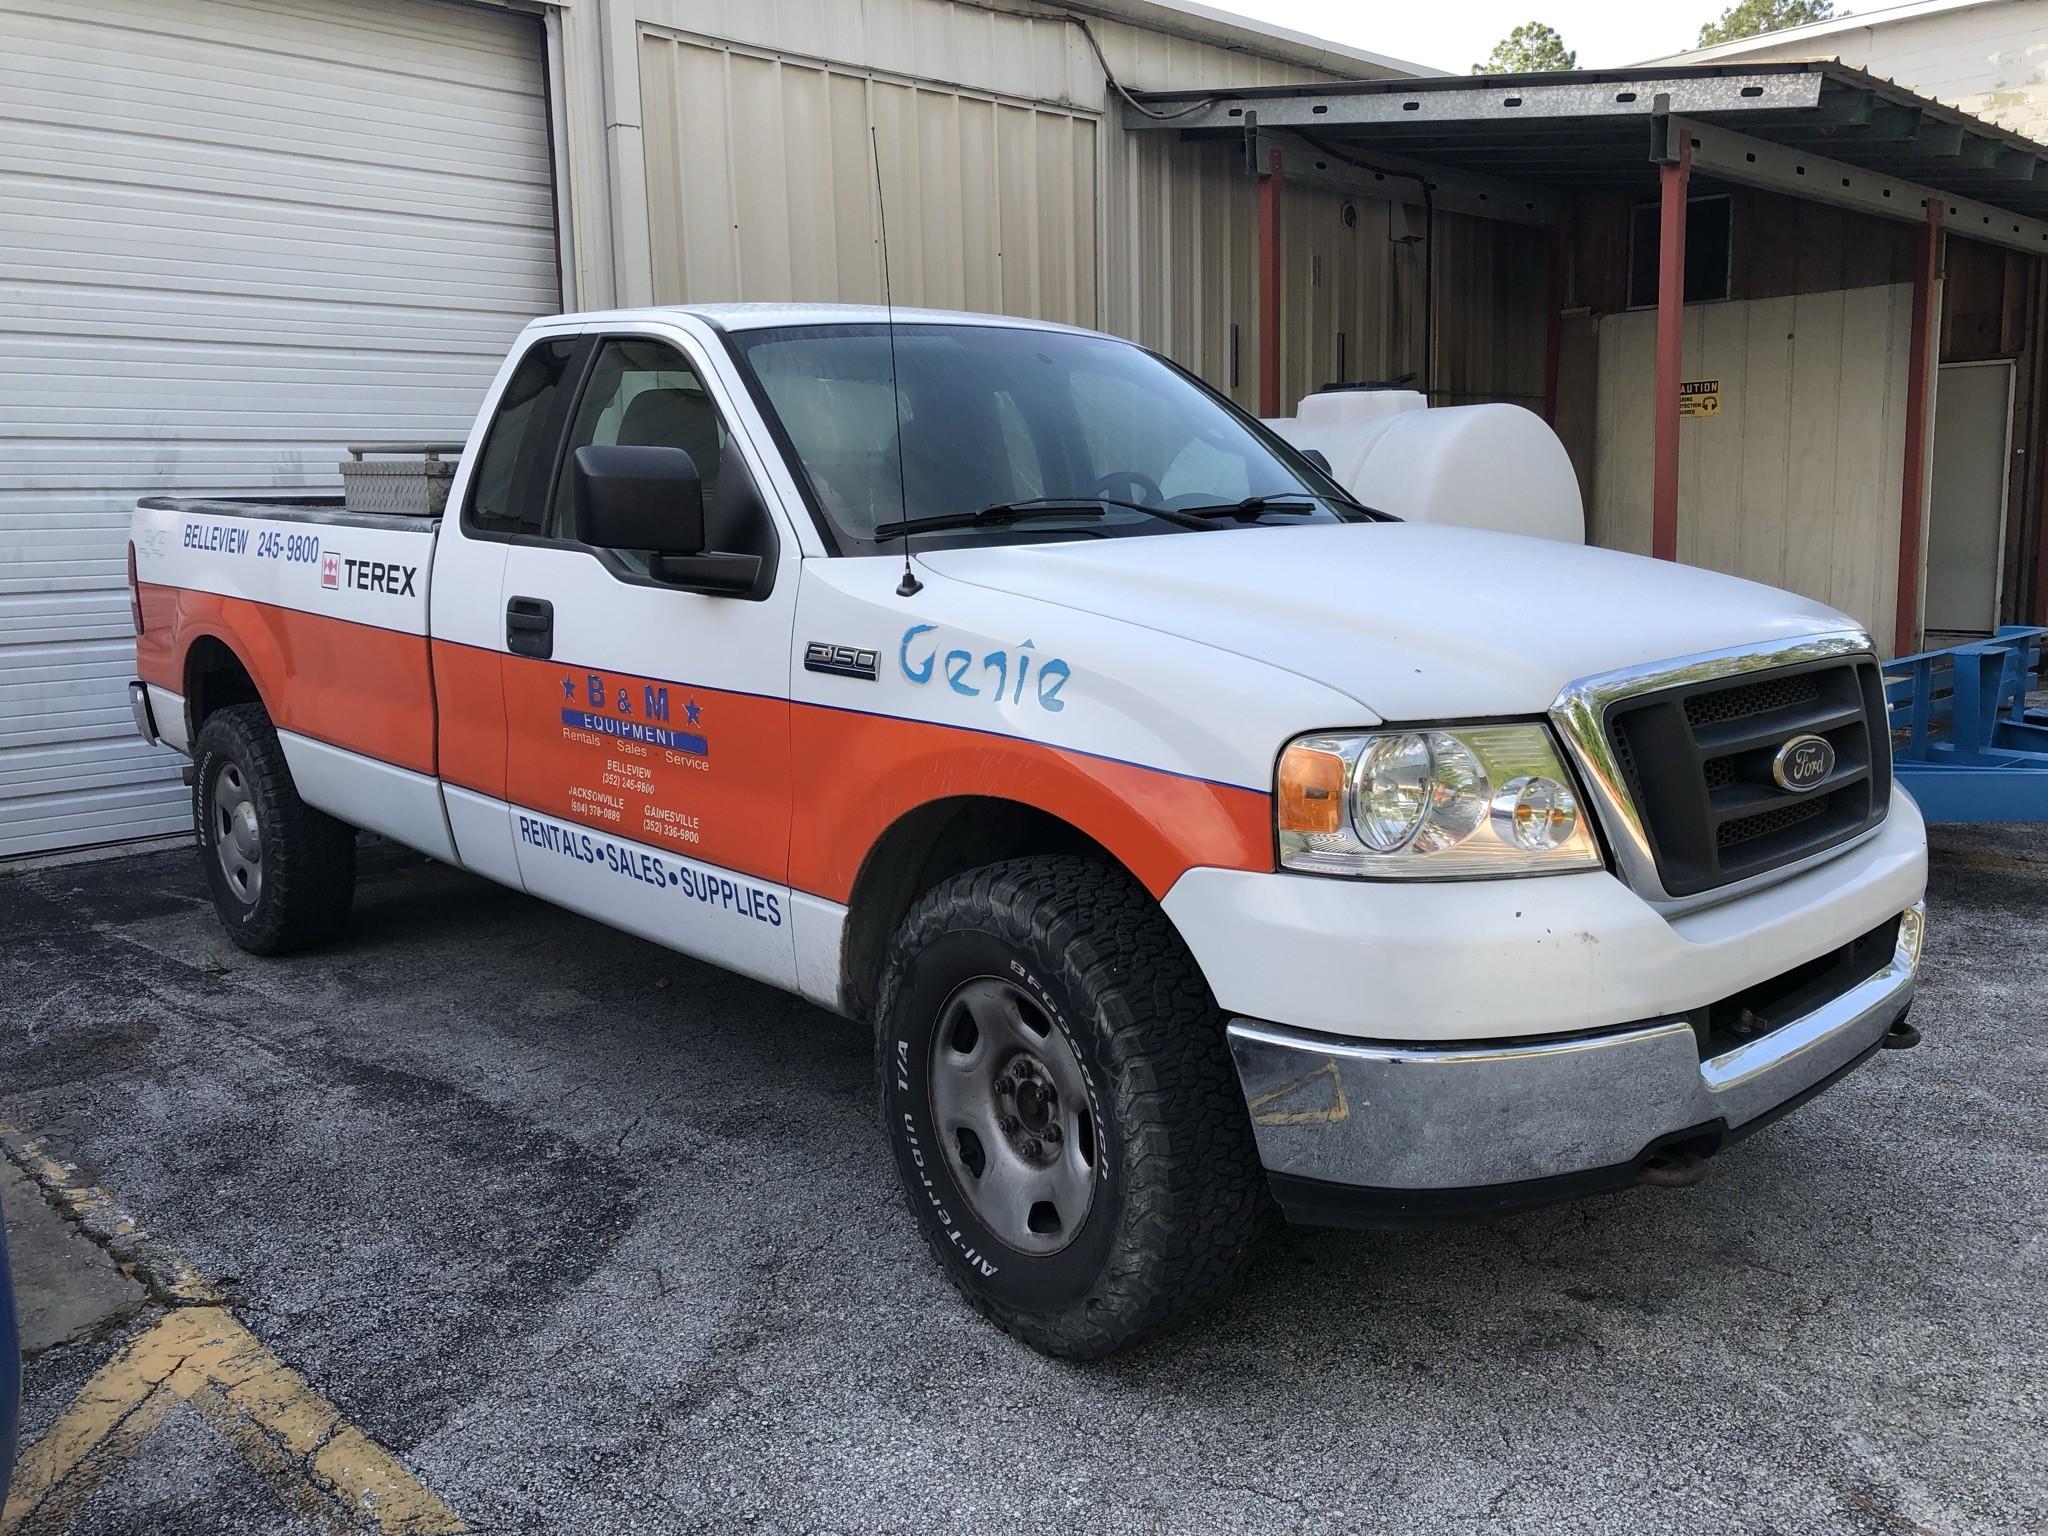 Used, 2004, Ford, F-150, Pickup Trucks